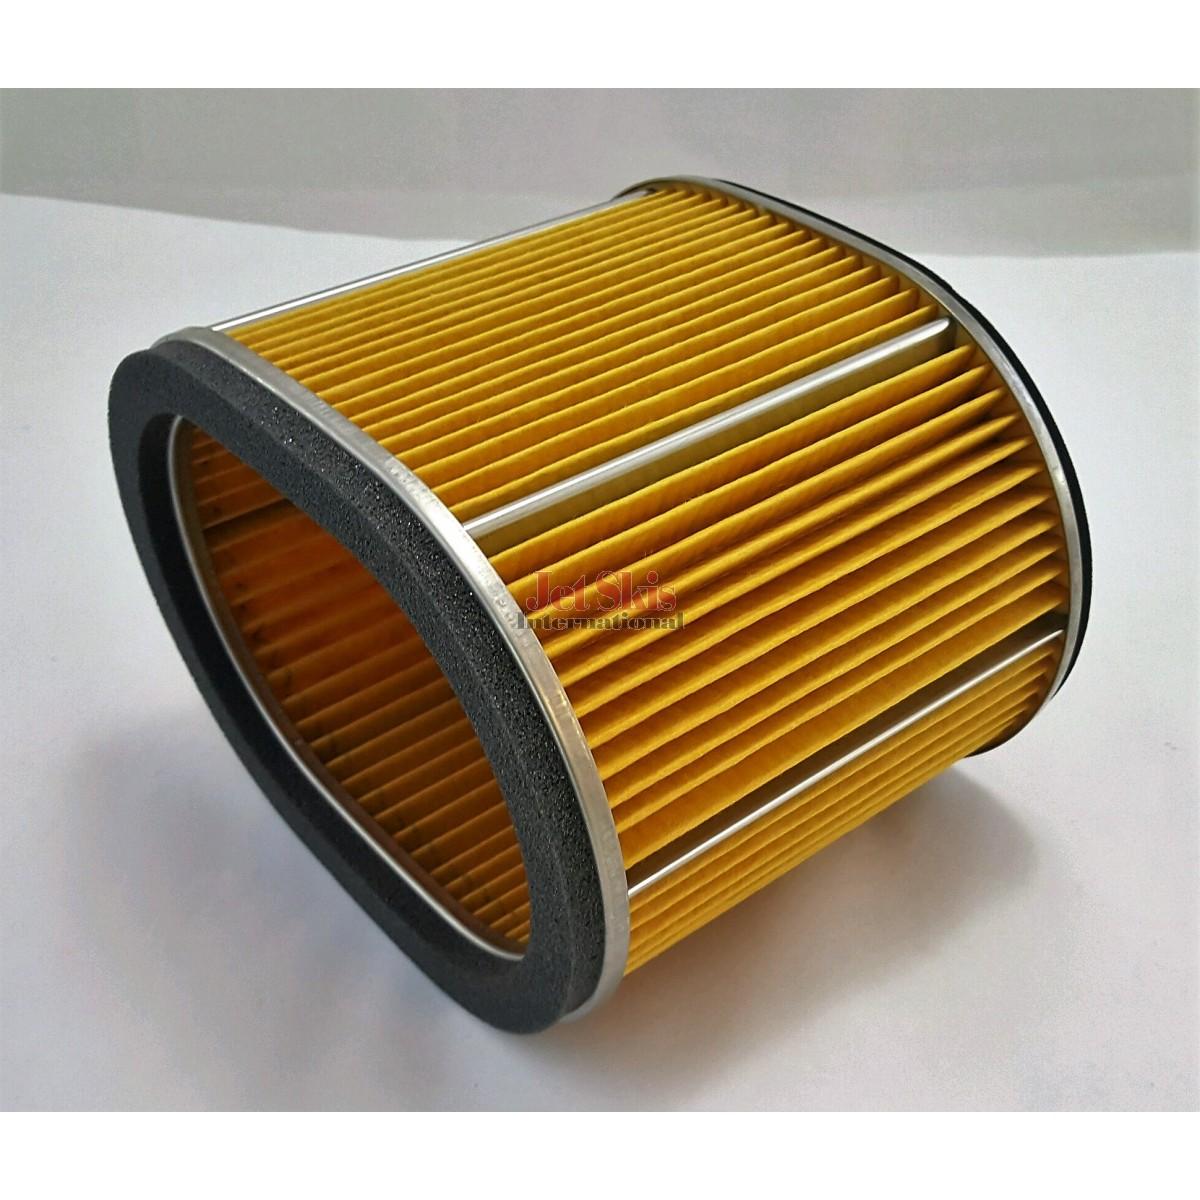 honda aquatrax part 17230 hw3 670 turbo air filter jet skis rh jetskisint com